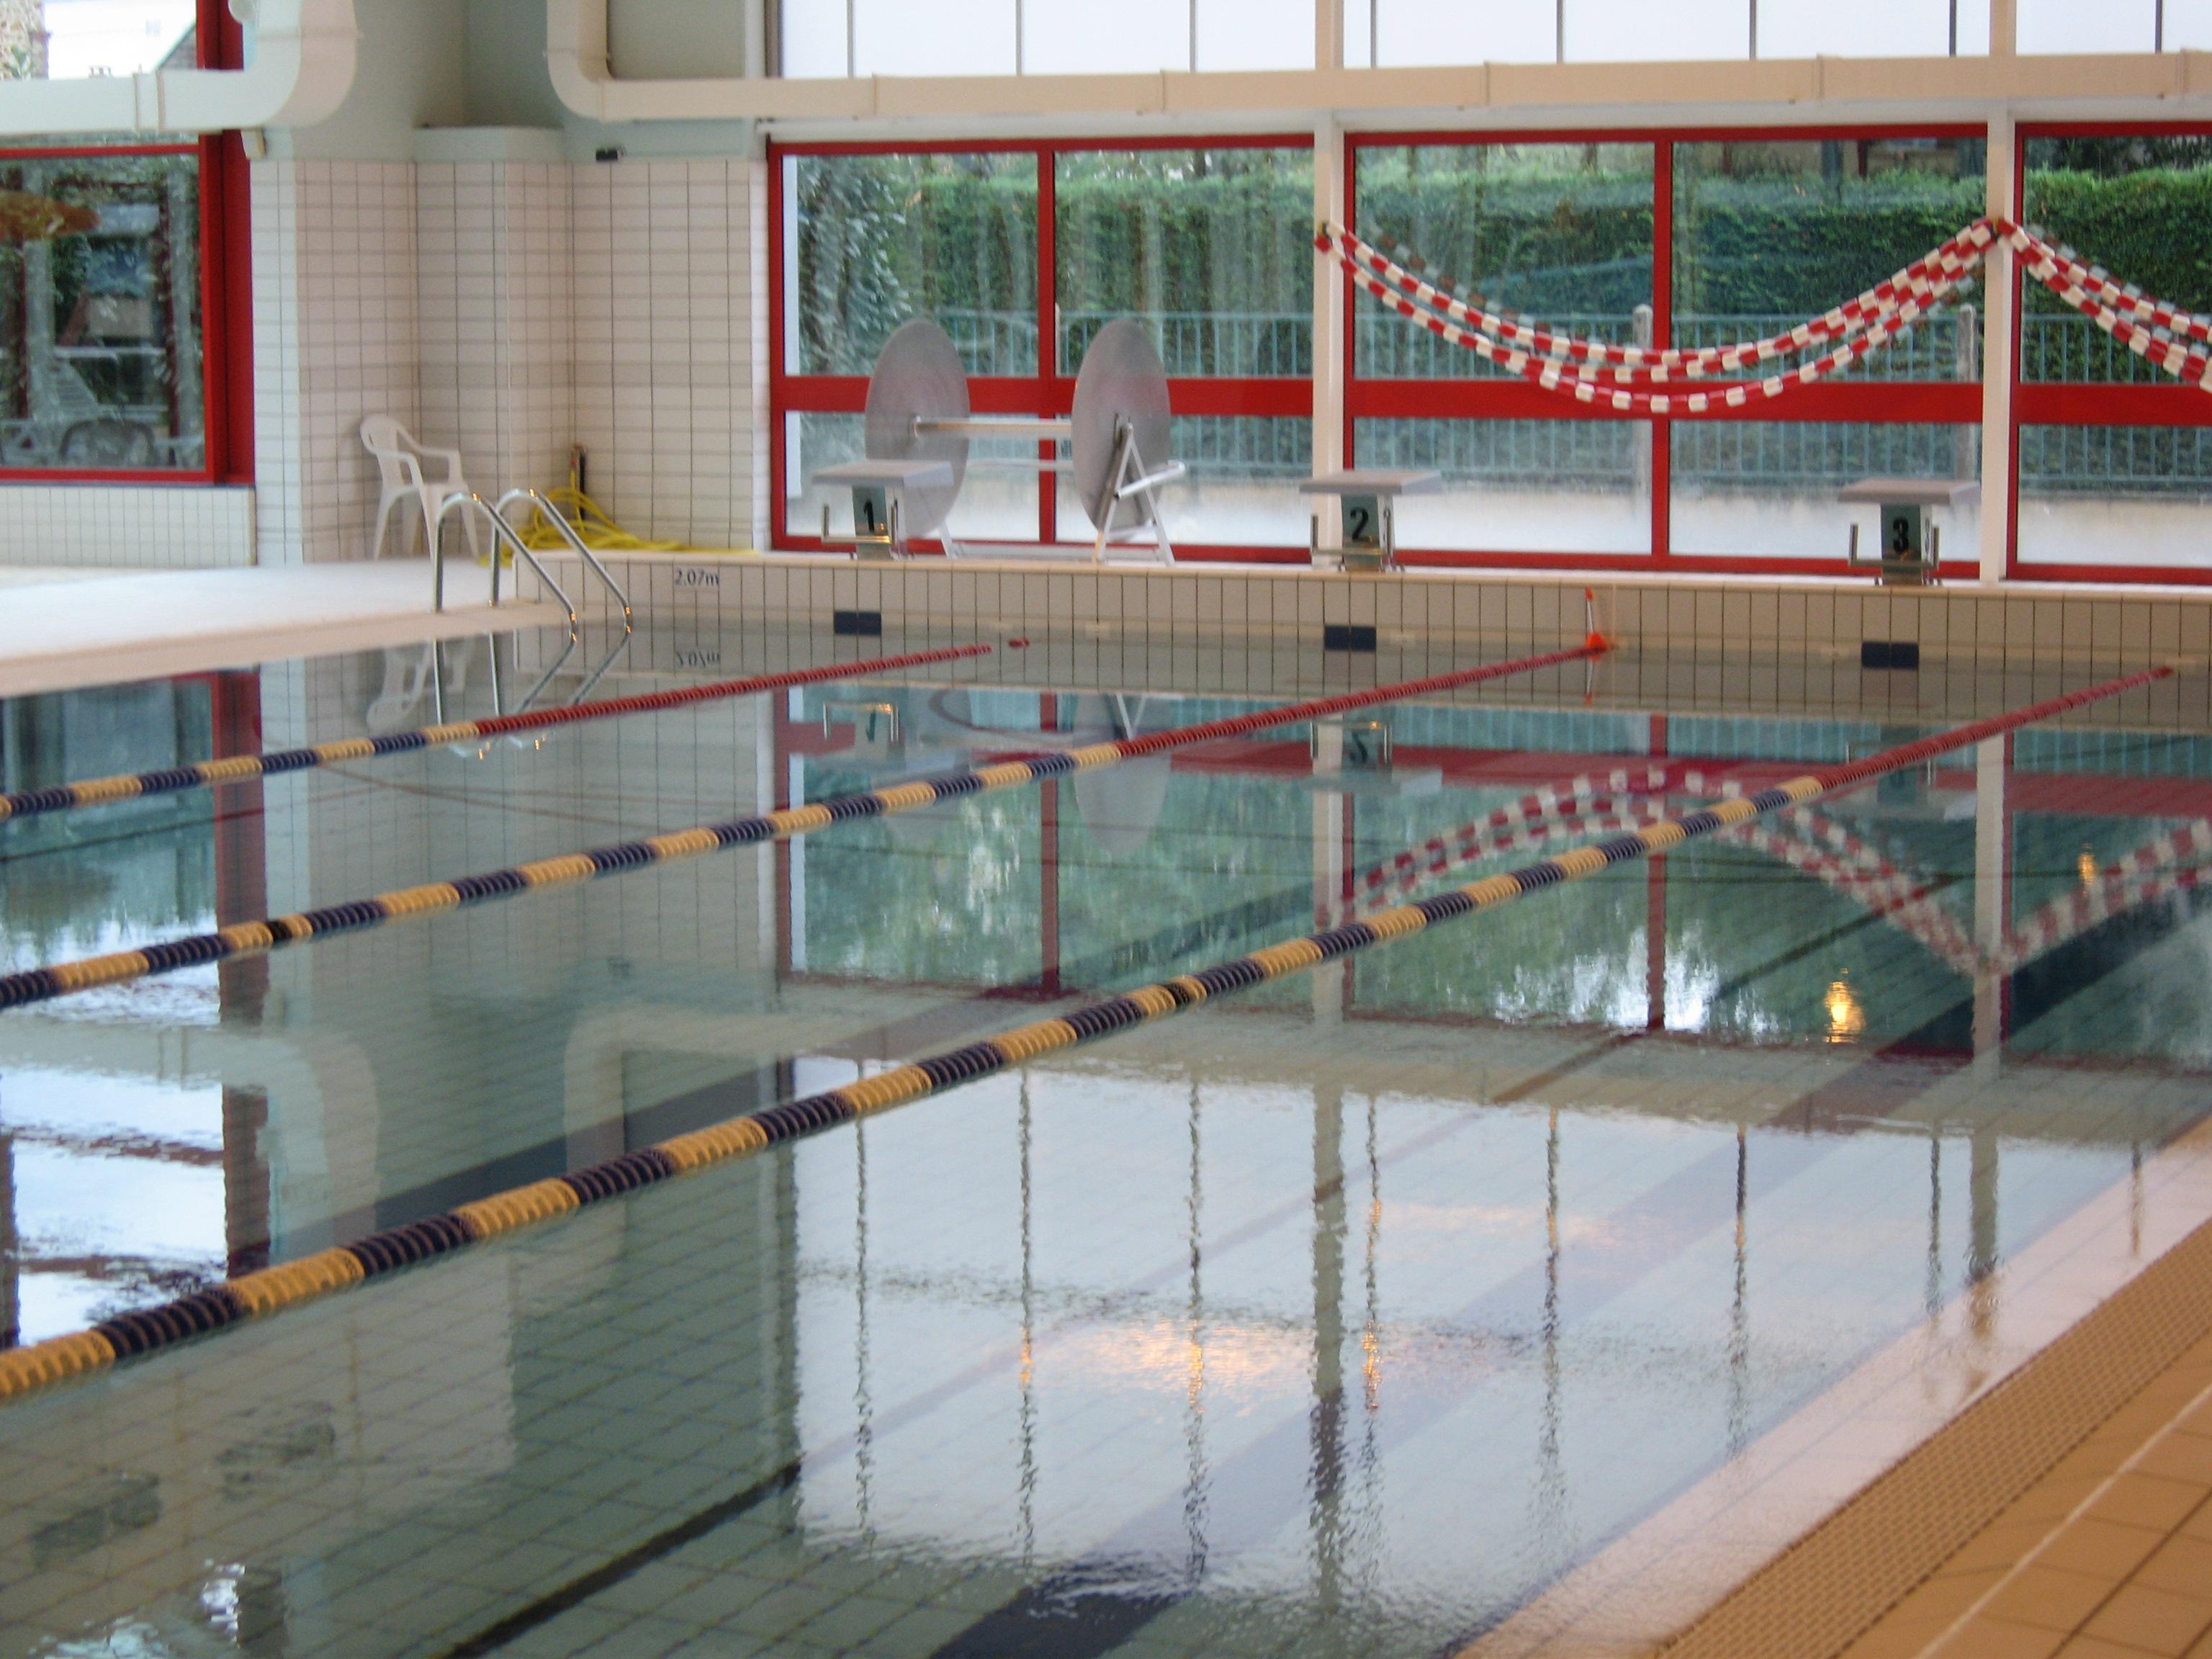 Travaux de la piscine de fontenay tr signy for Travaux piscine